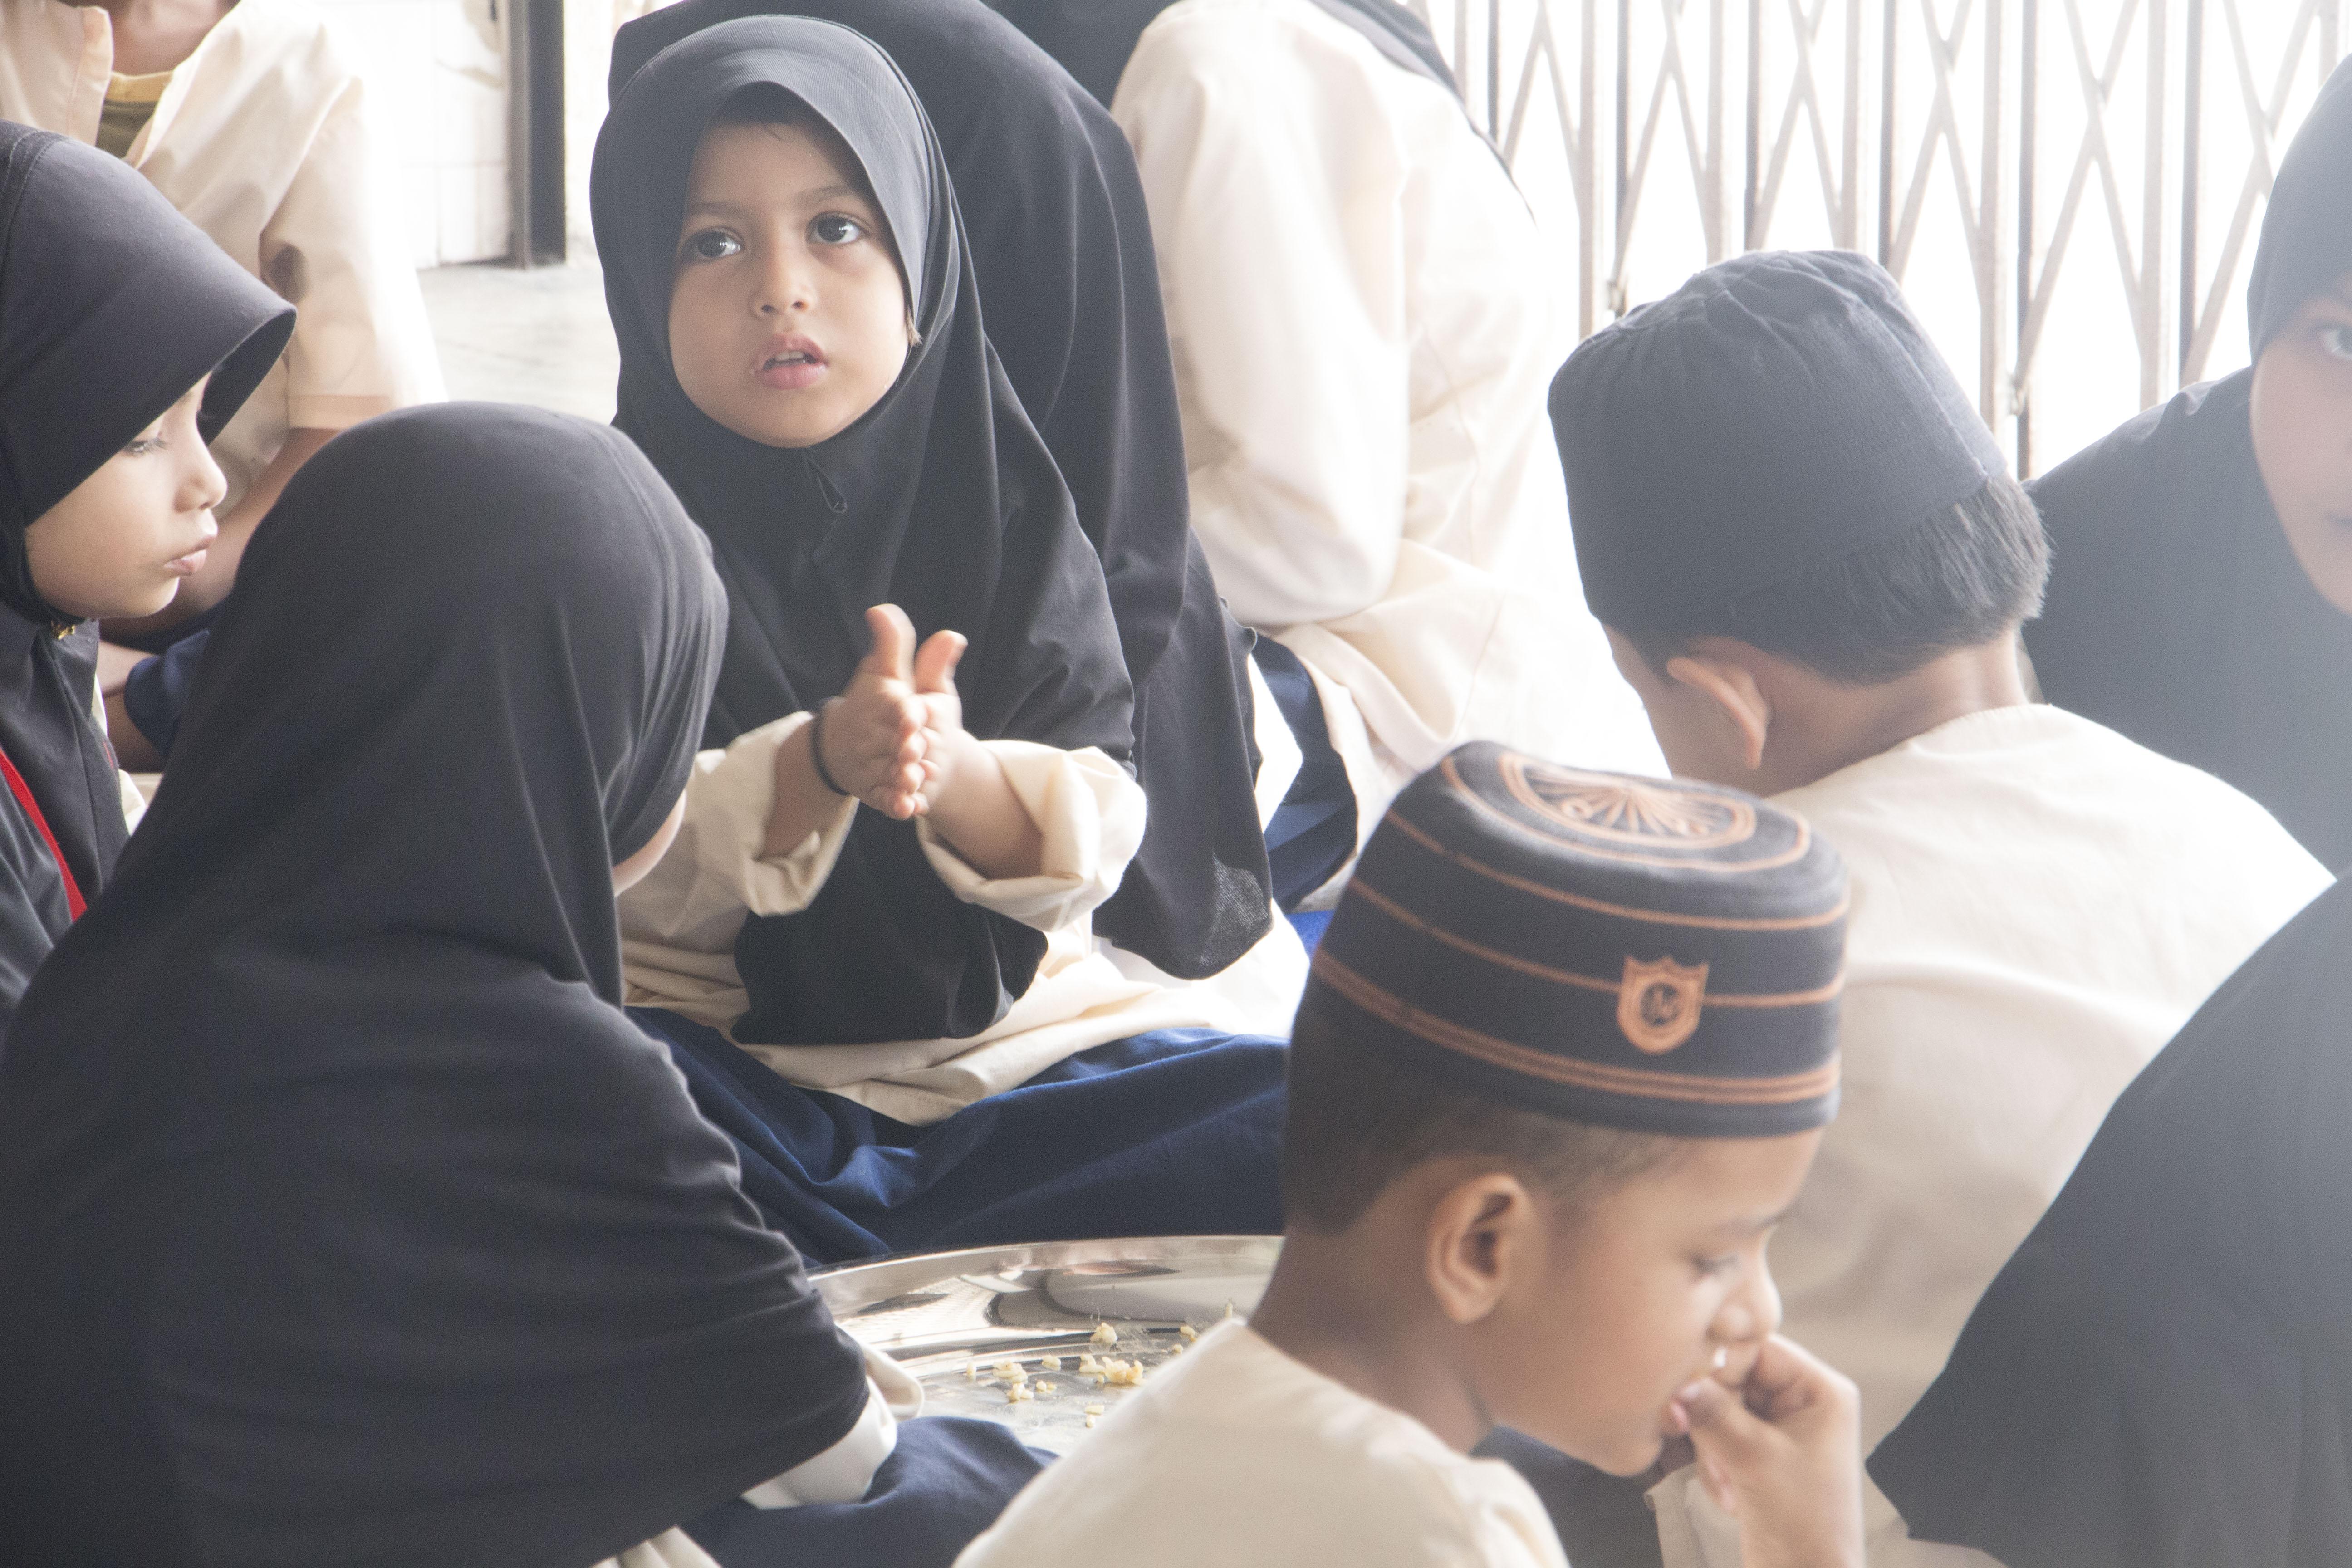 Inside Malaysia's 'Living Hell' for Refugee Children